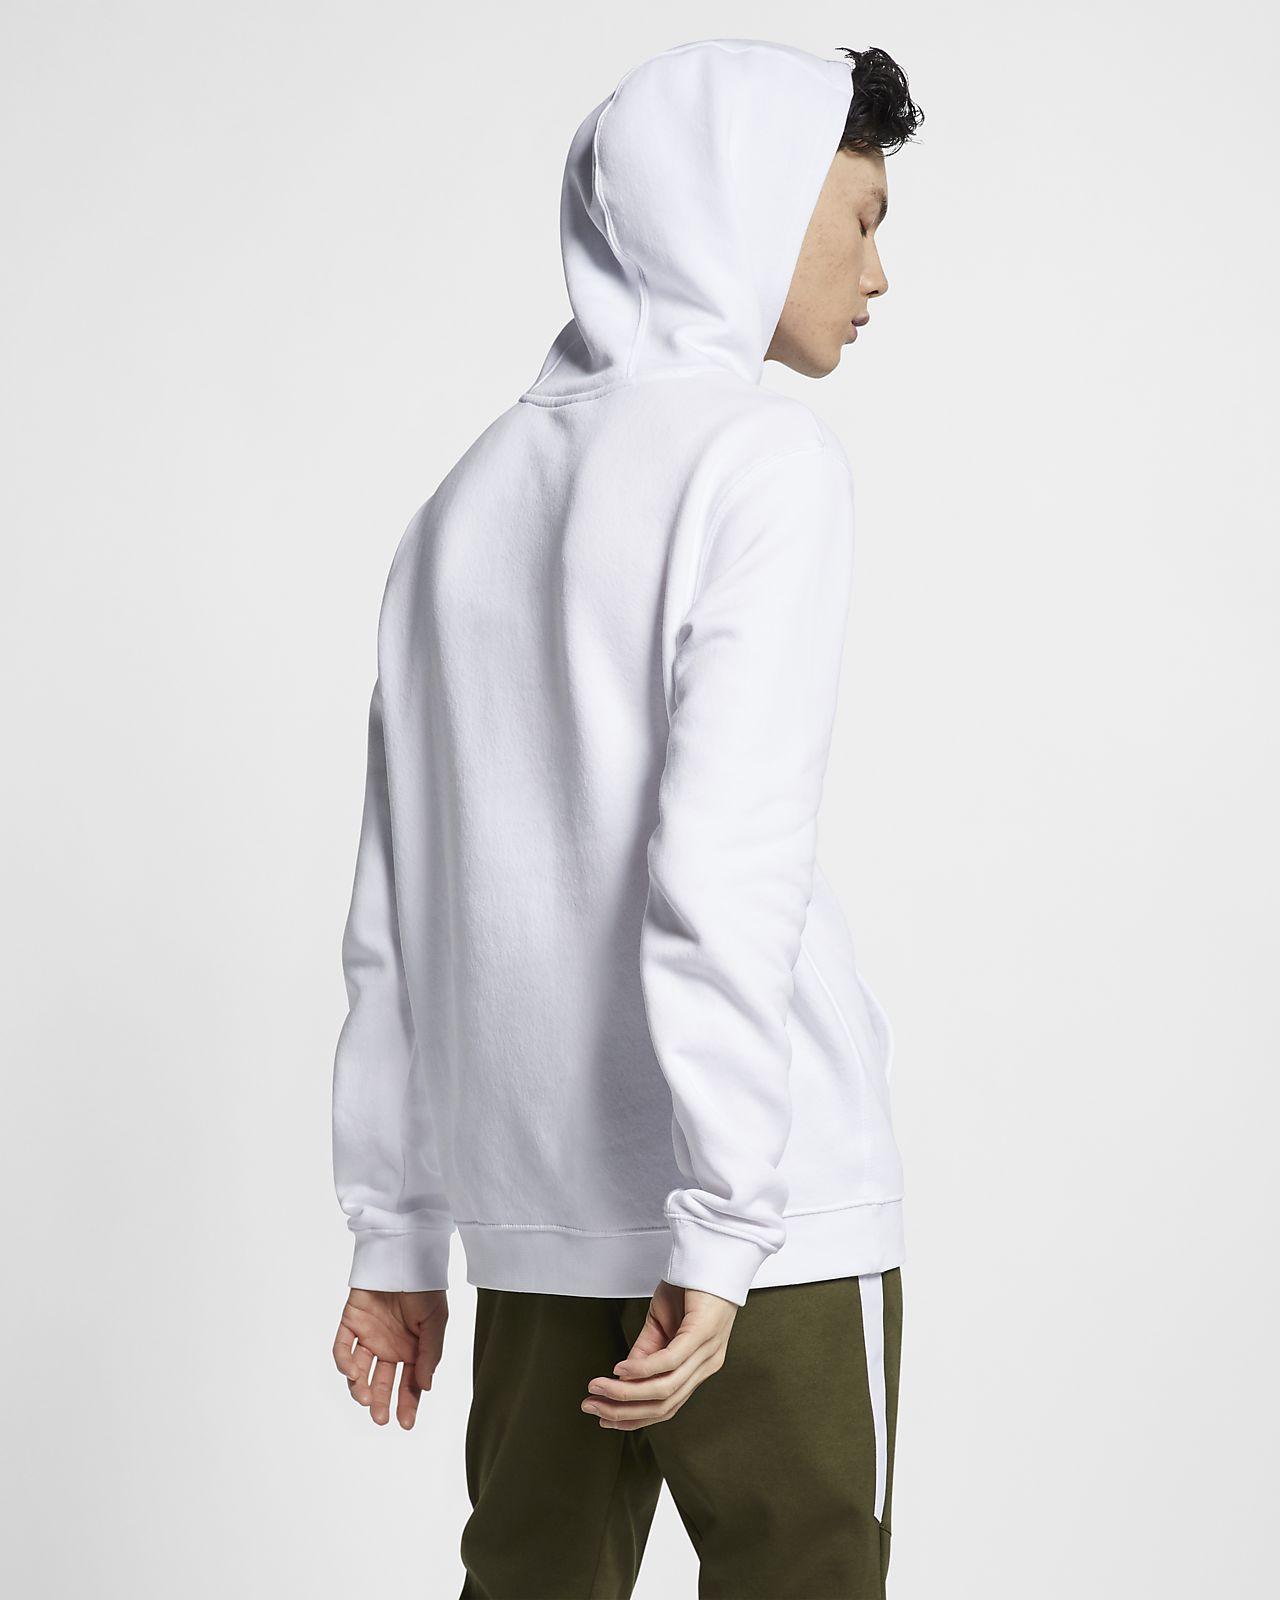 newest 96cb5 9b439 ... Sweat à capuche Nike Sportswear Club Fleece pour Homme